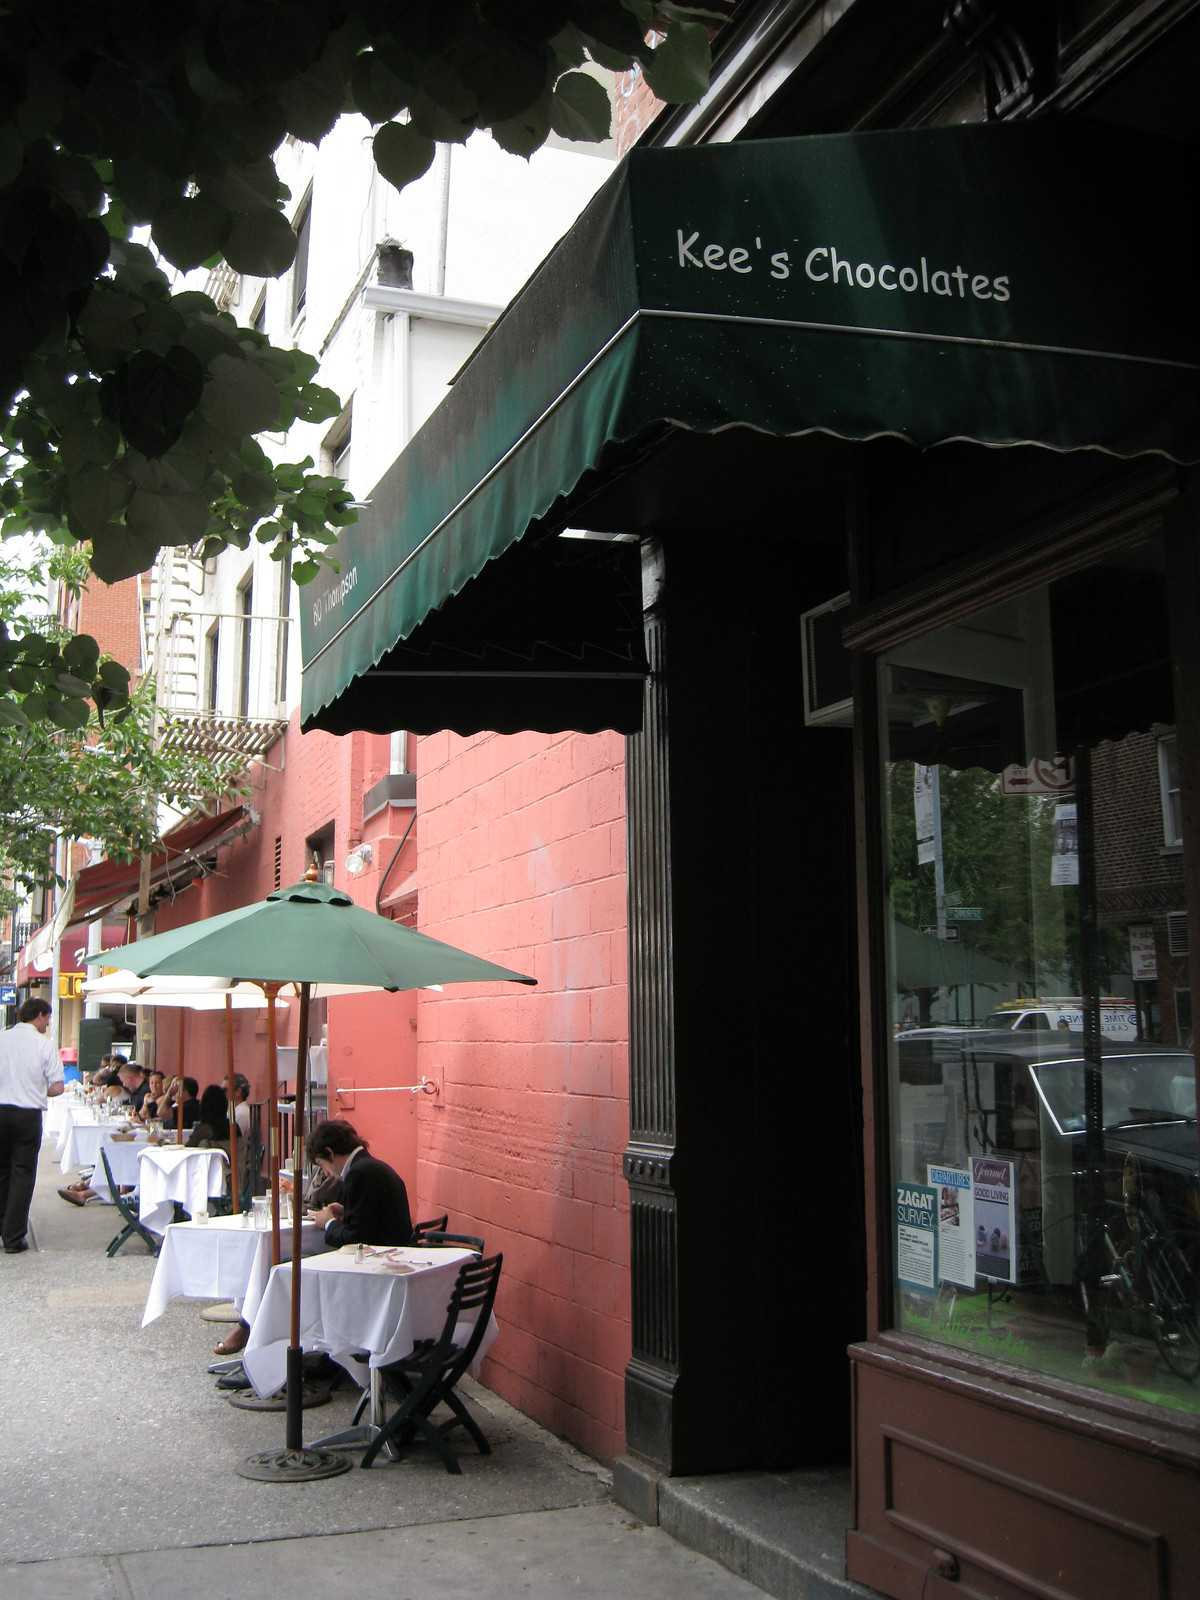 магазин шоколада Шоколад у Кии Kee's Chocolates Нью–Йорк